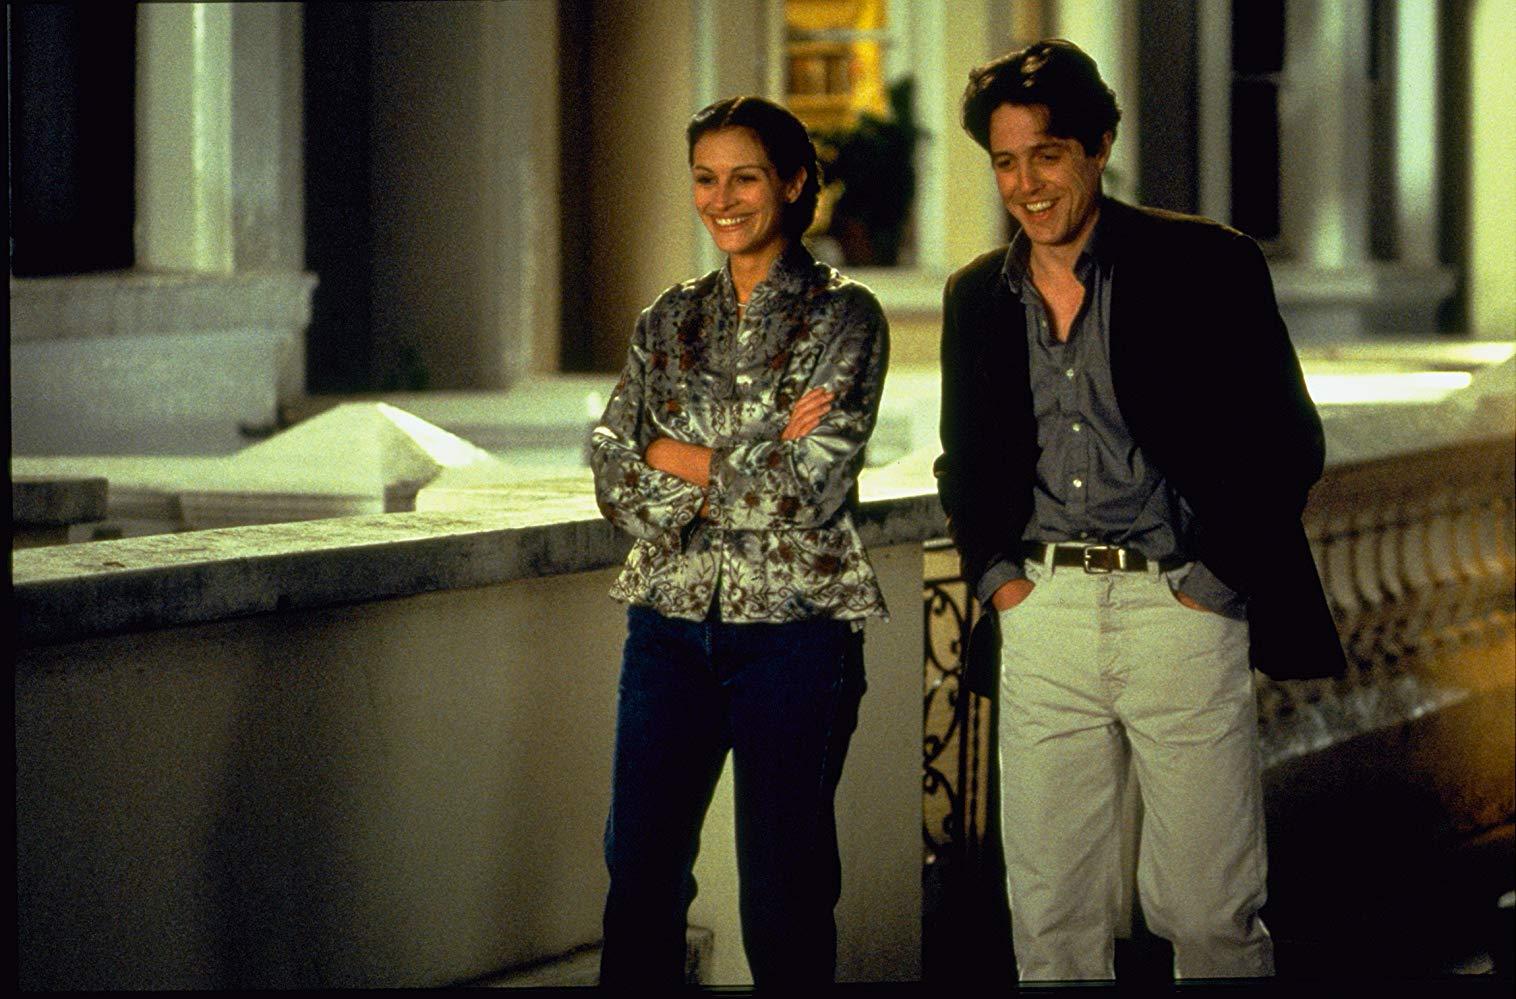 100. Notting Hill (1999)